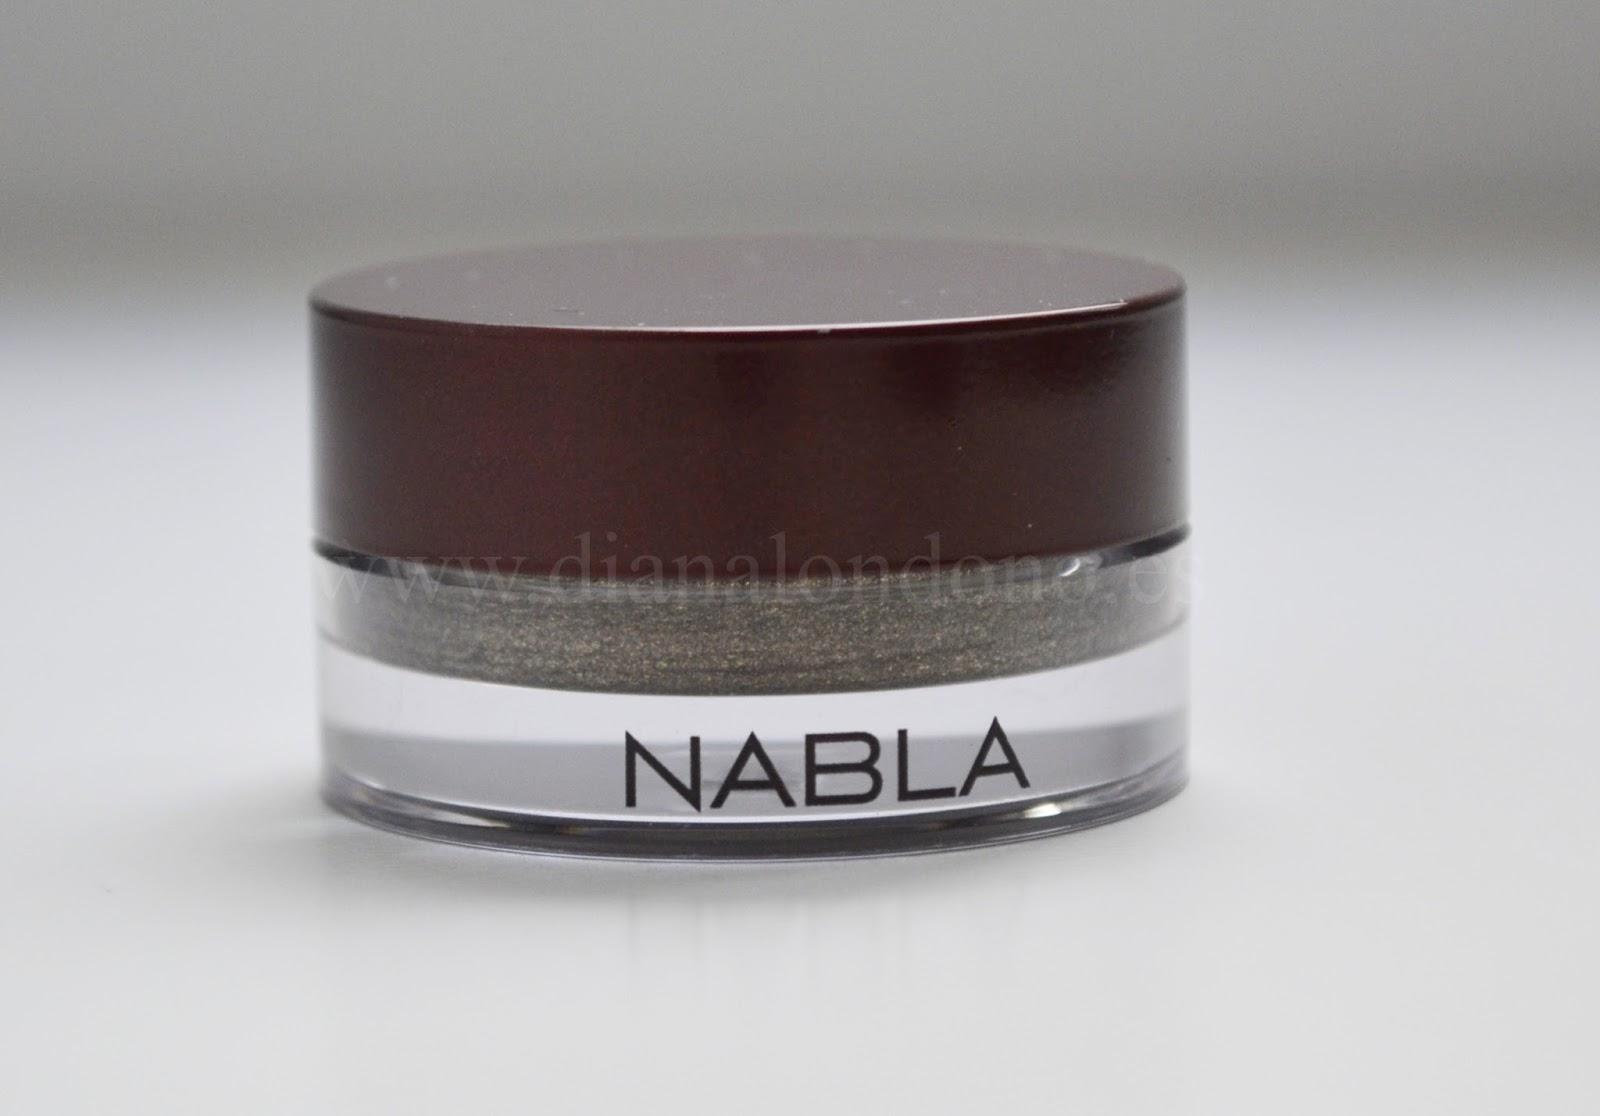 Sombra en crema tono husky Nabla cosmetcis